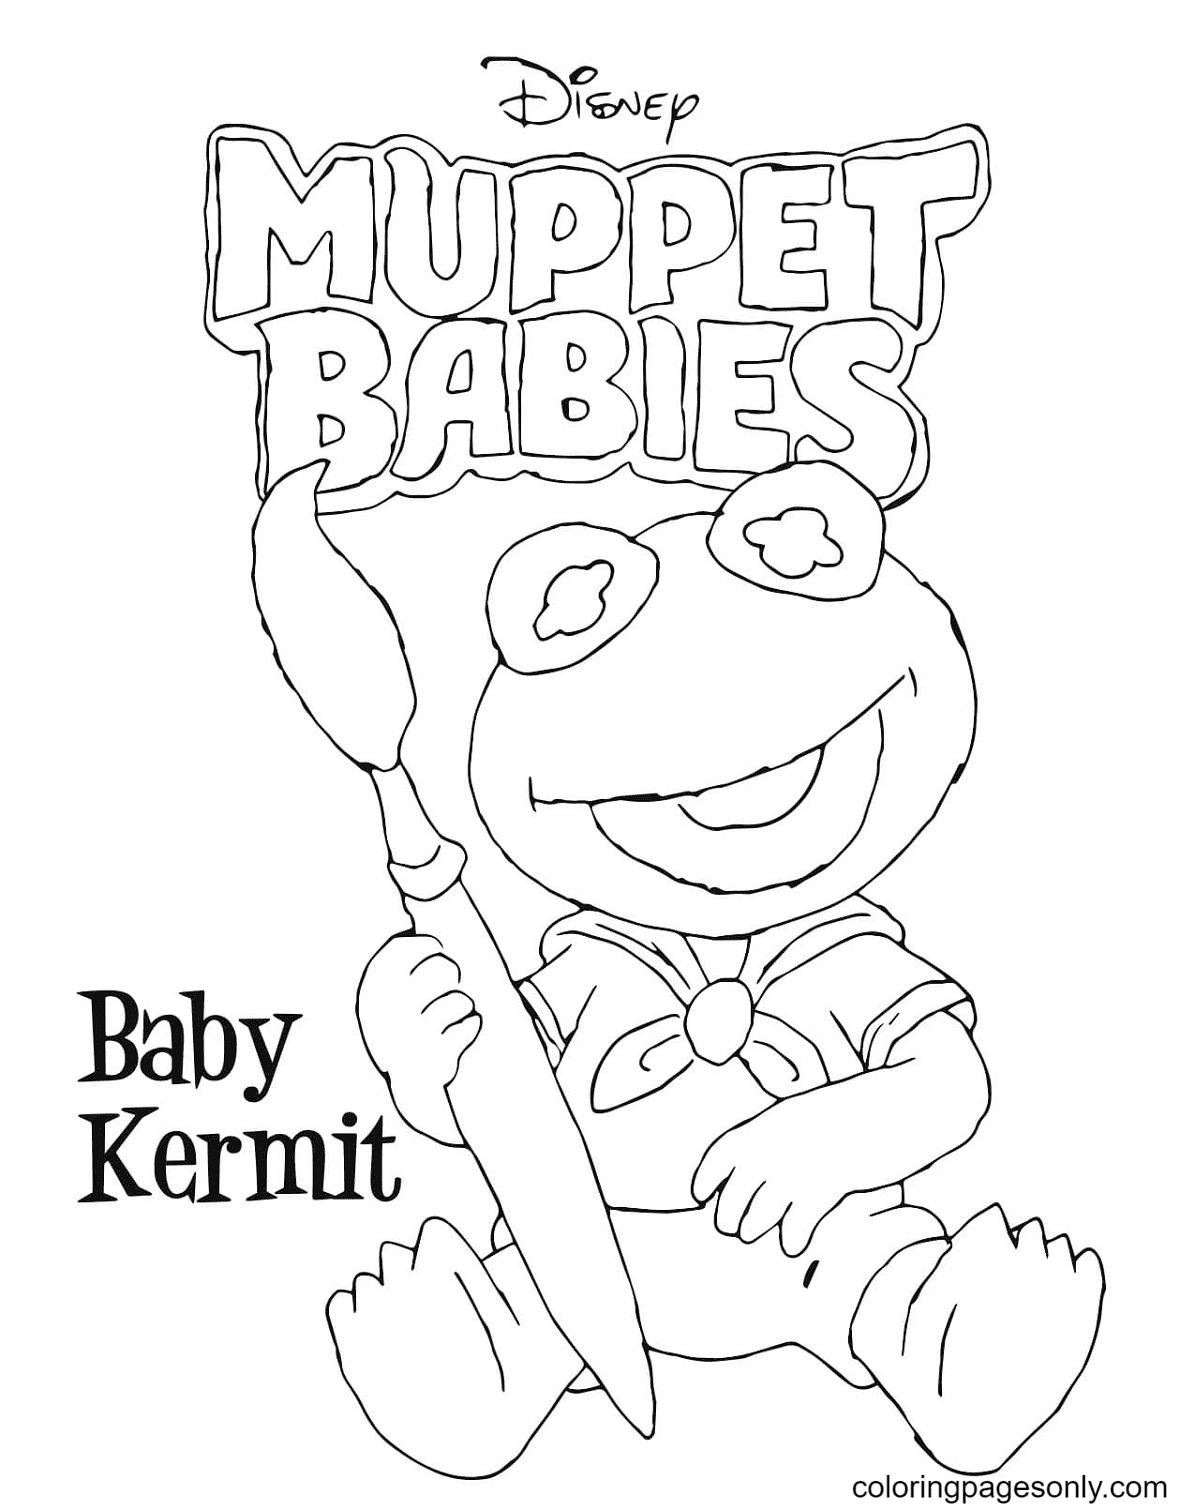 Baby Keramit Coloring Page